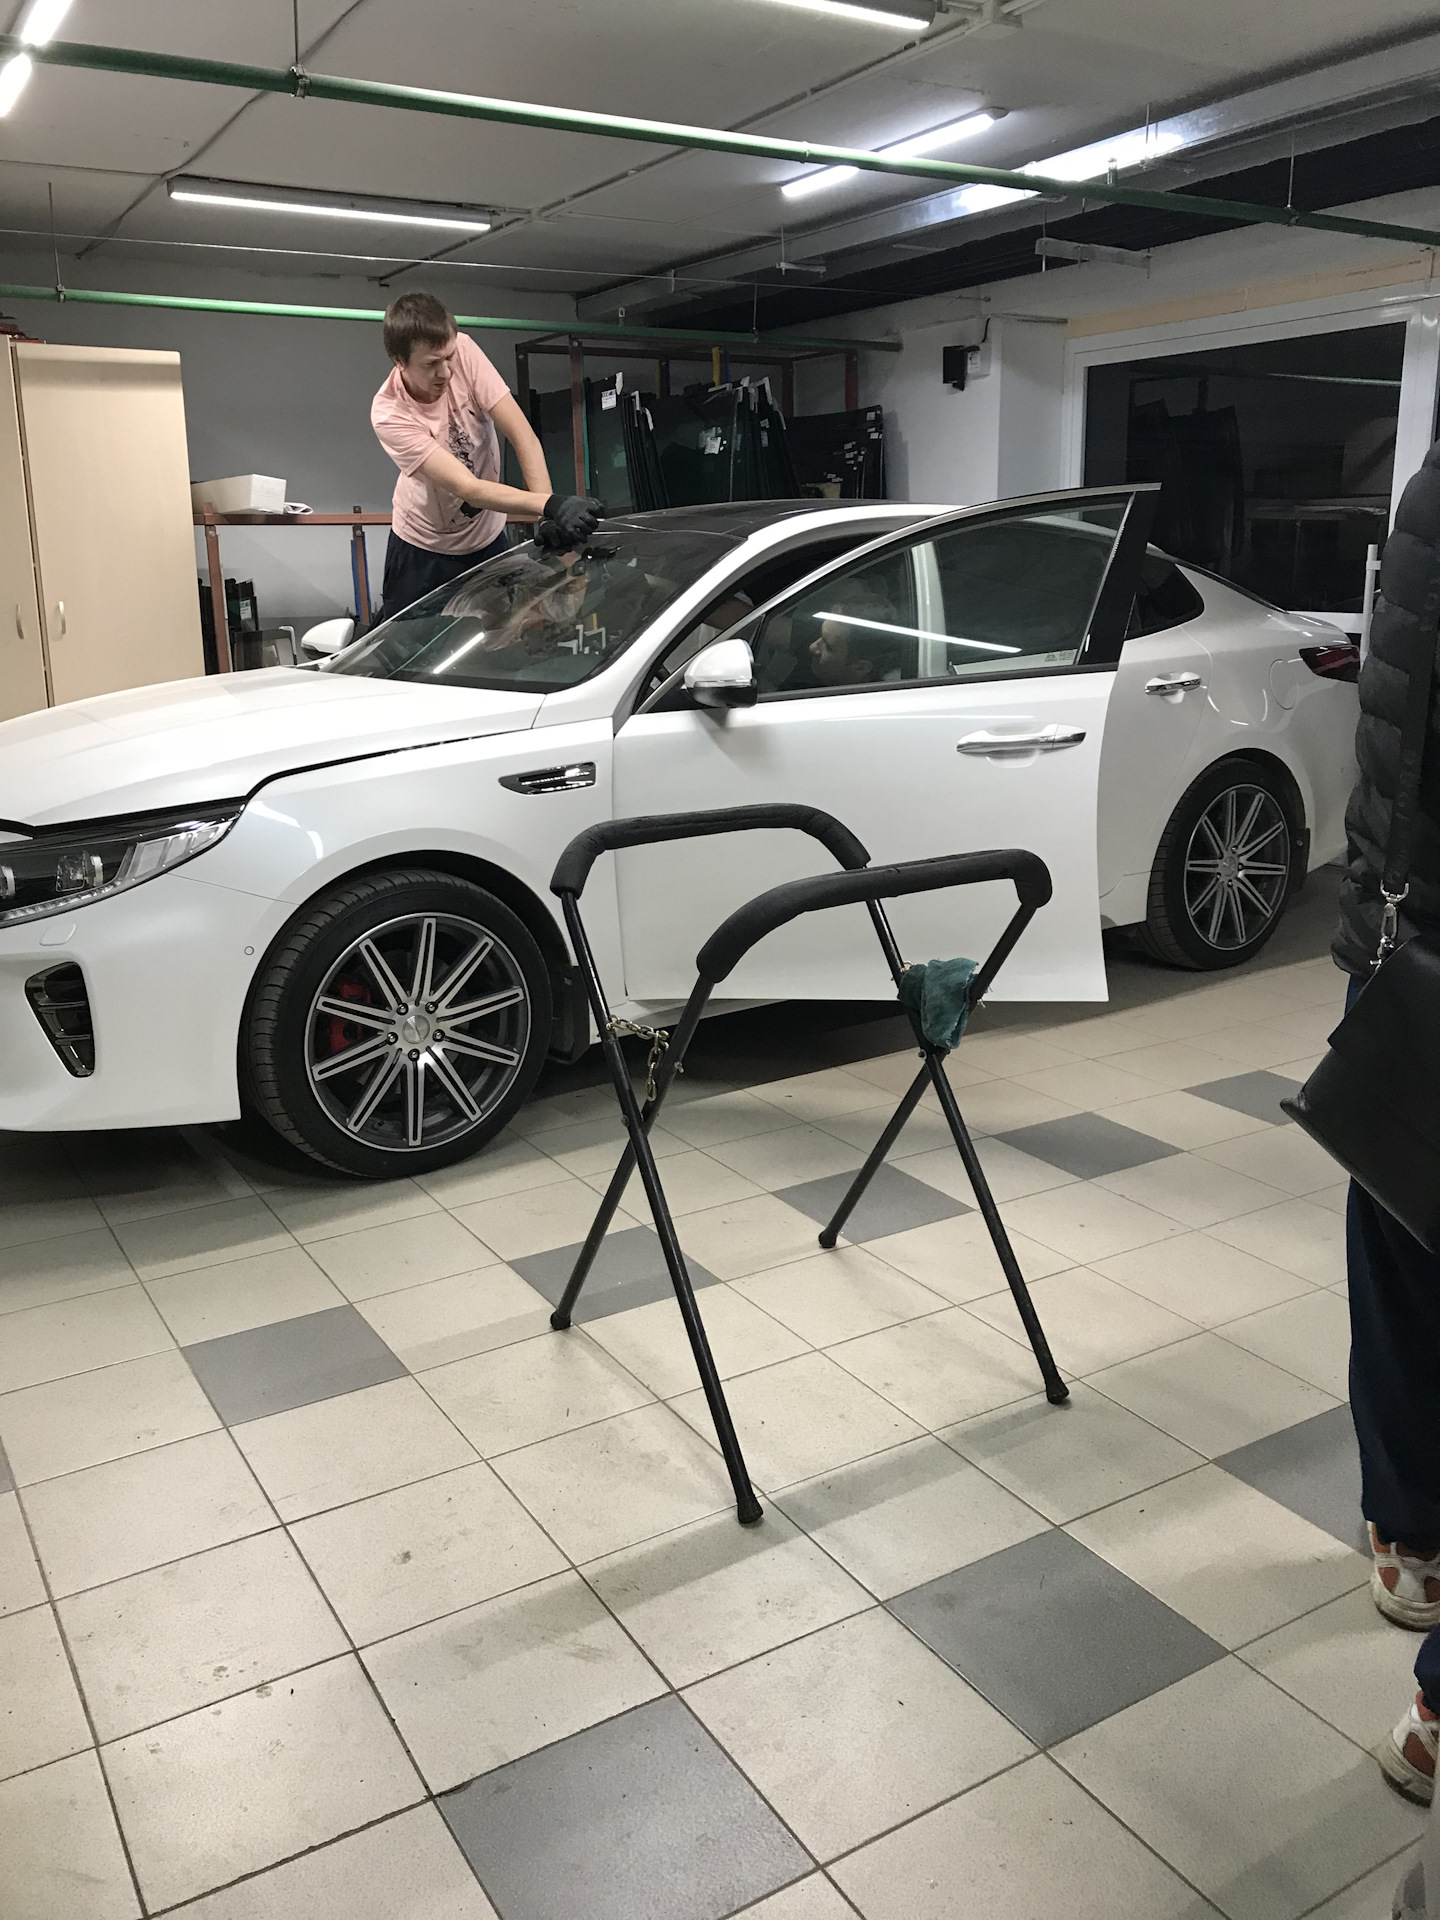 Замена лобового стекла на КИА Оптима 2018